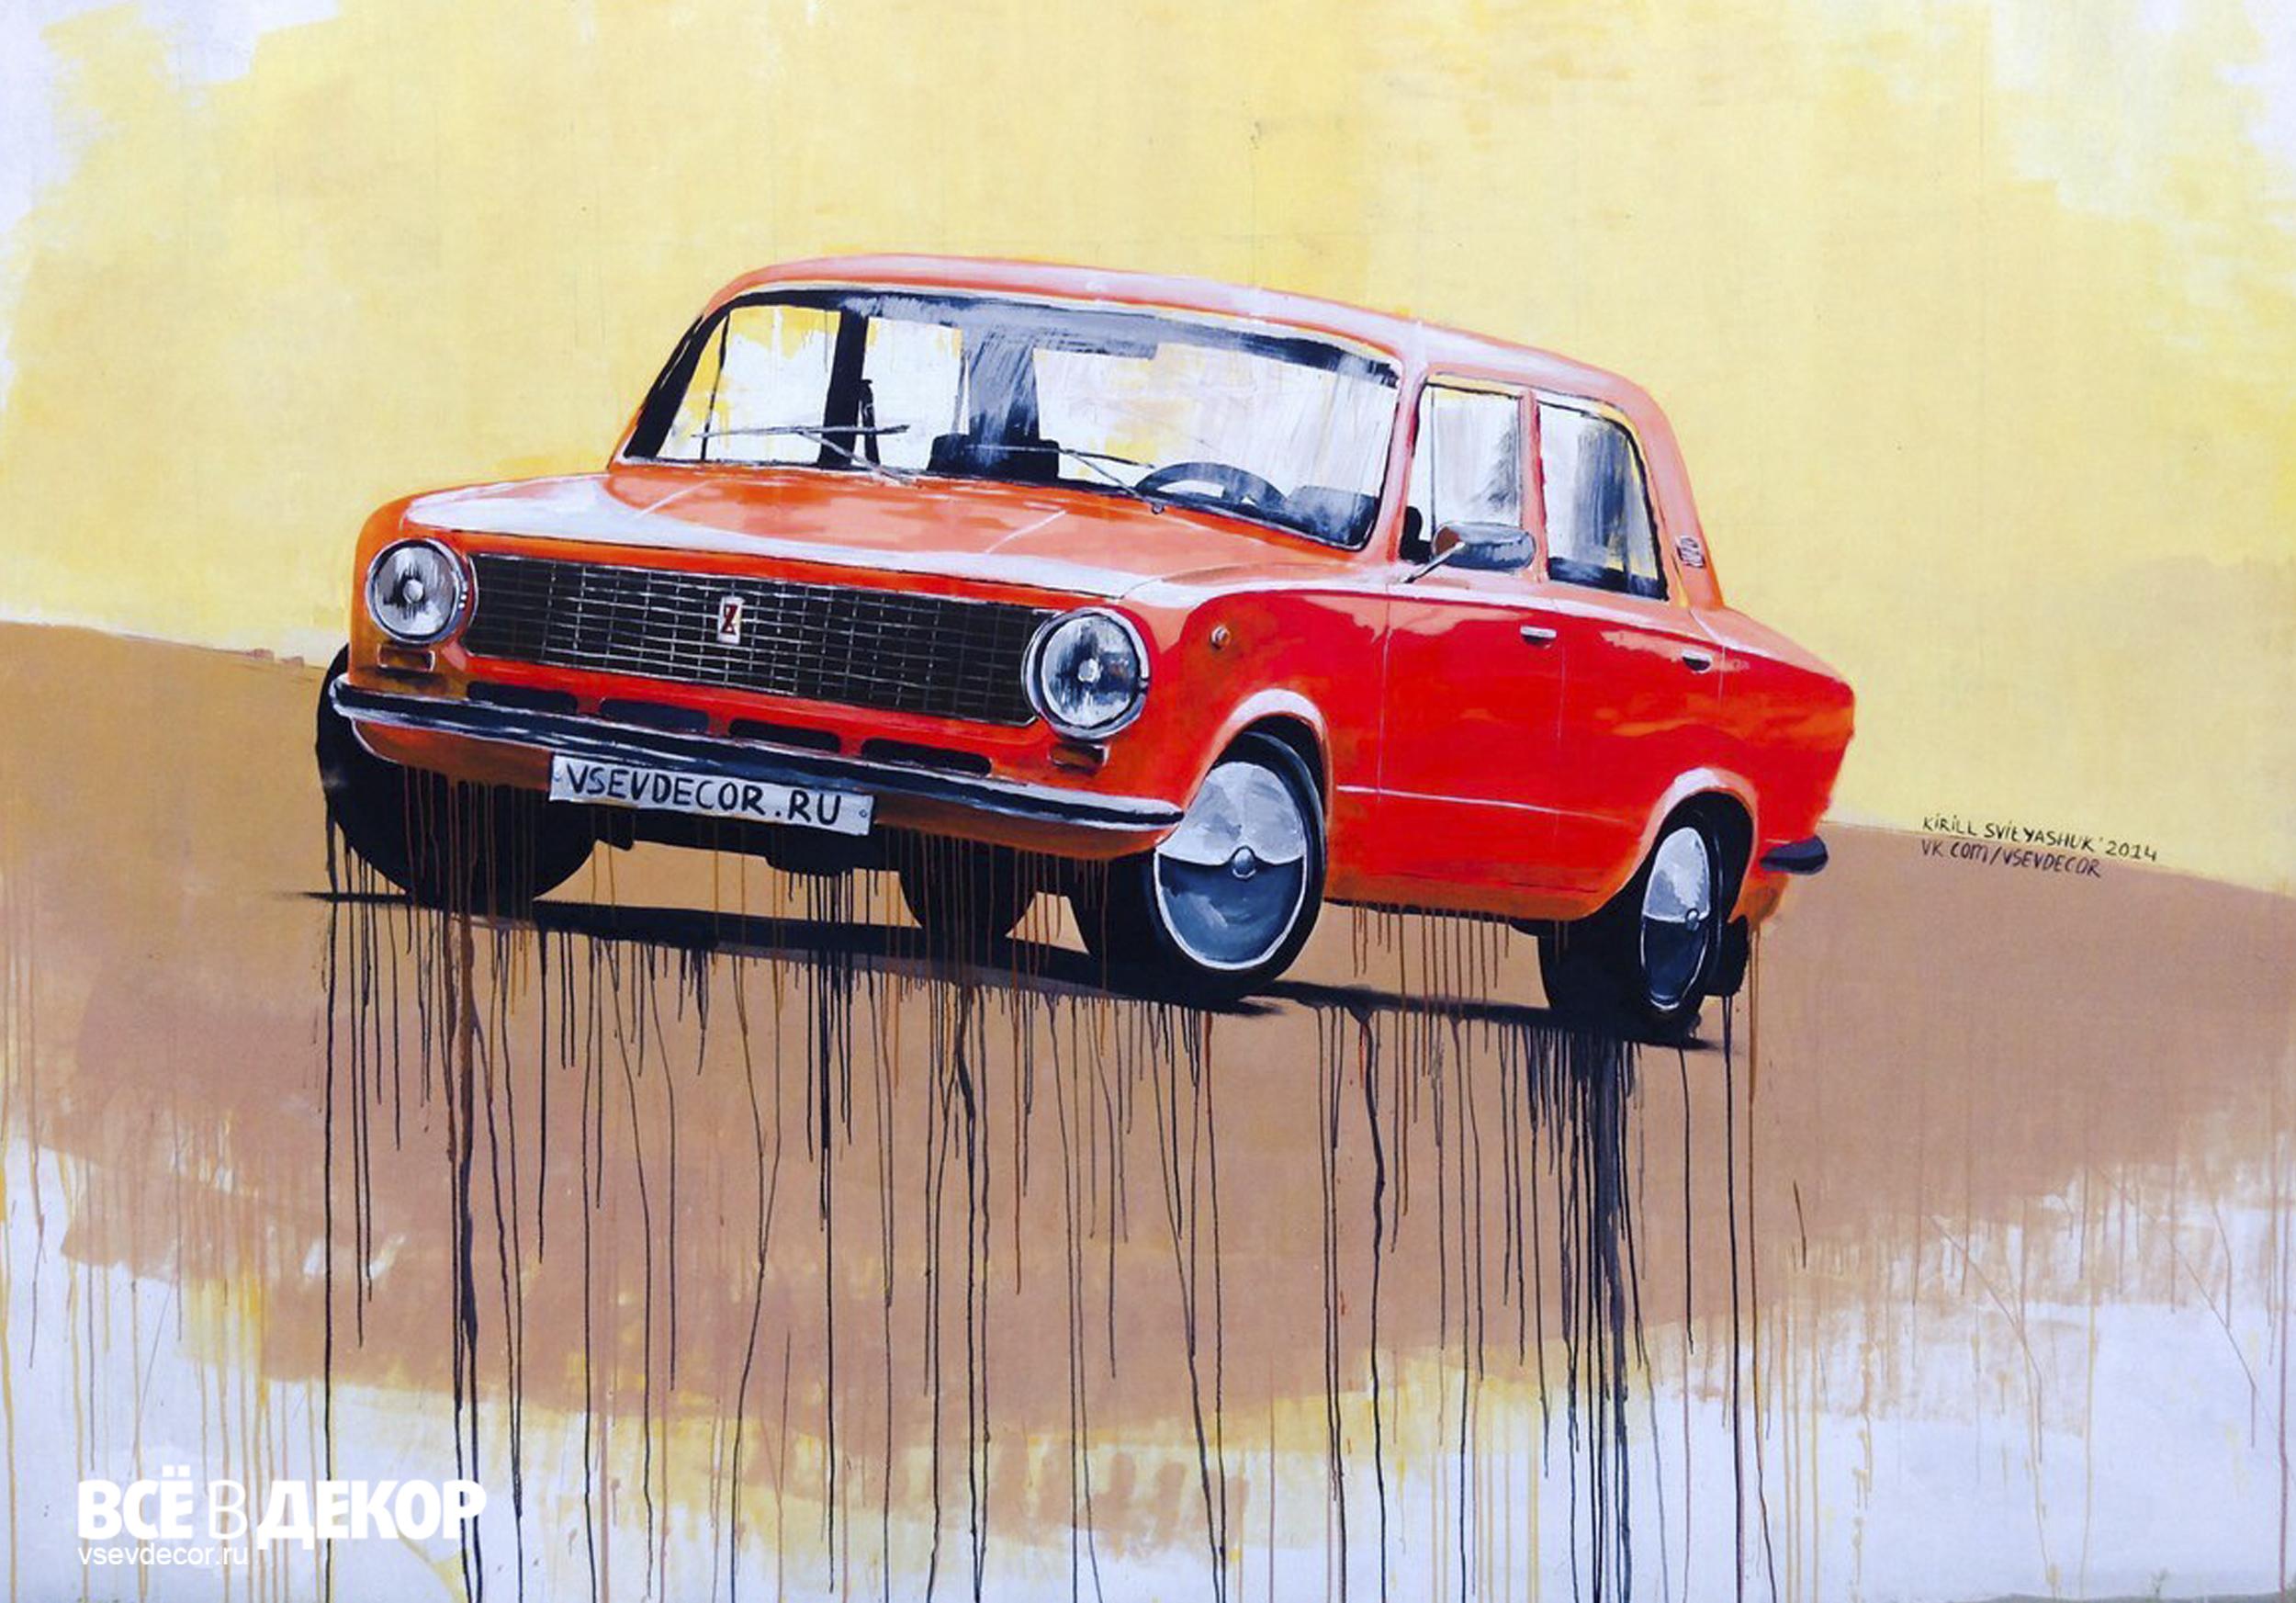 Граффити на заборе, Автомобиль Копейка, граффити машина, граффити ваз 2101, ваз 2101 рисунок